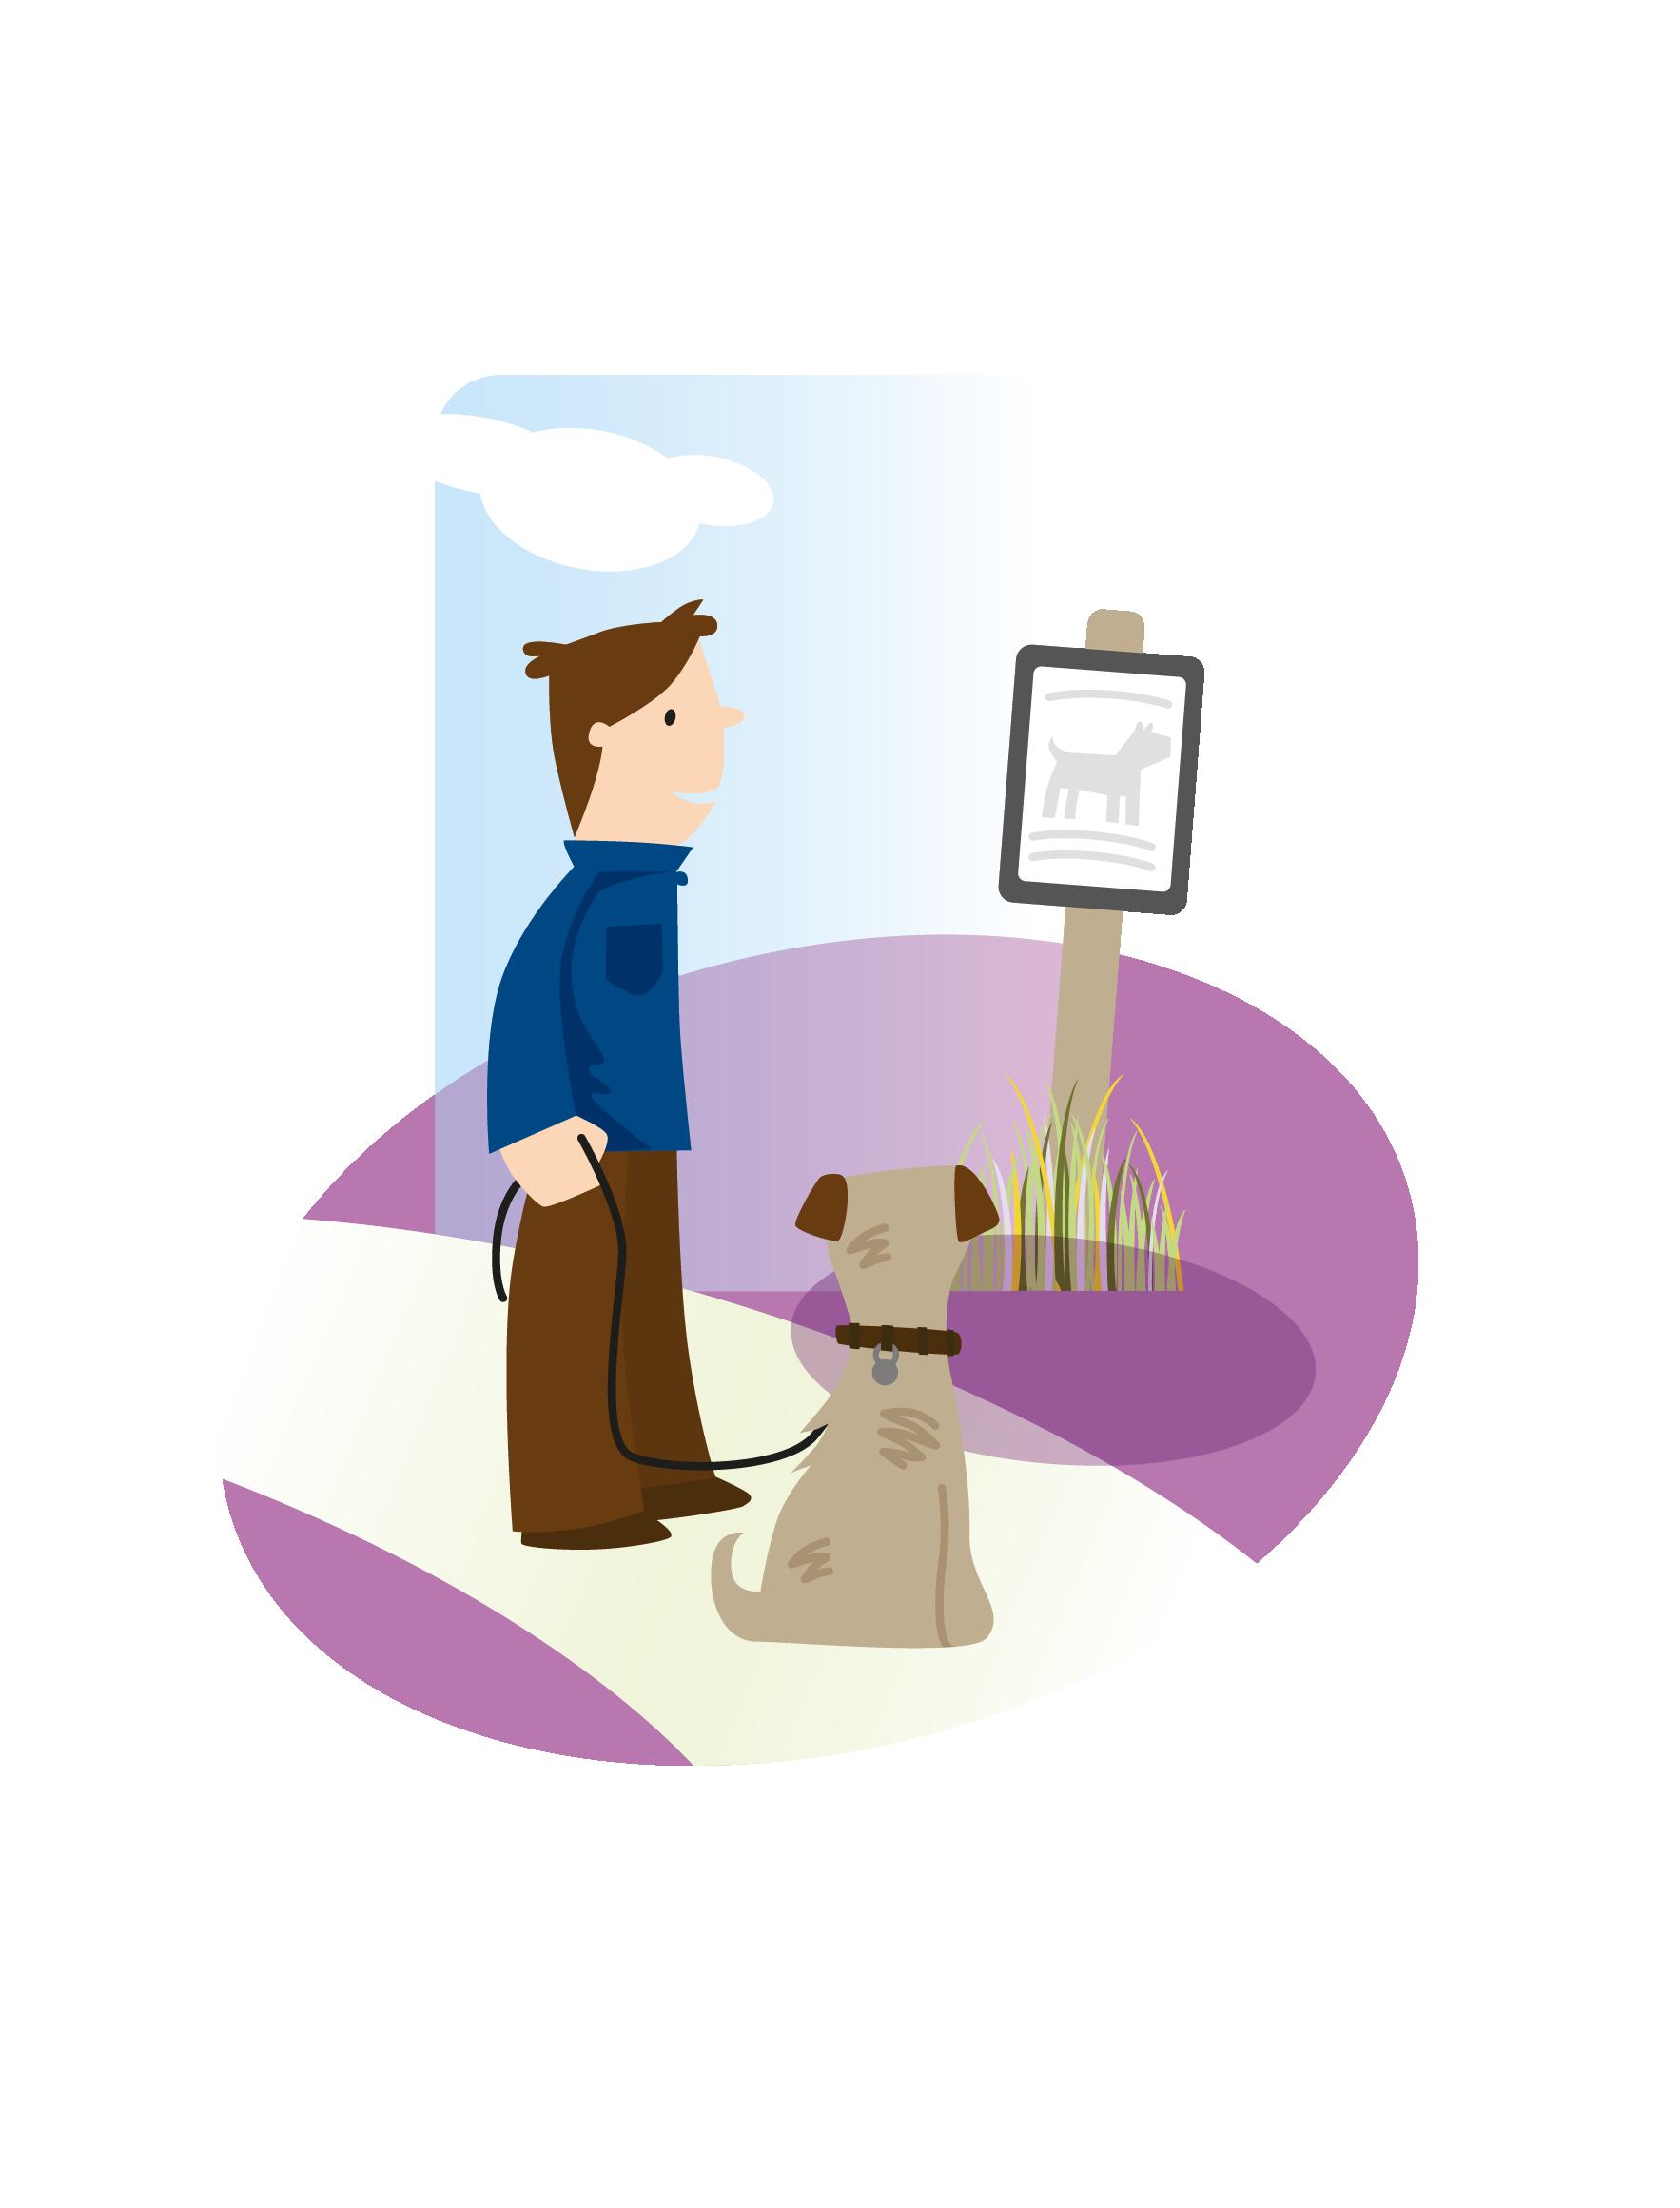 Image of dog walker reading an information board